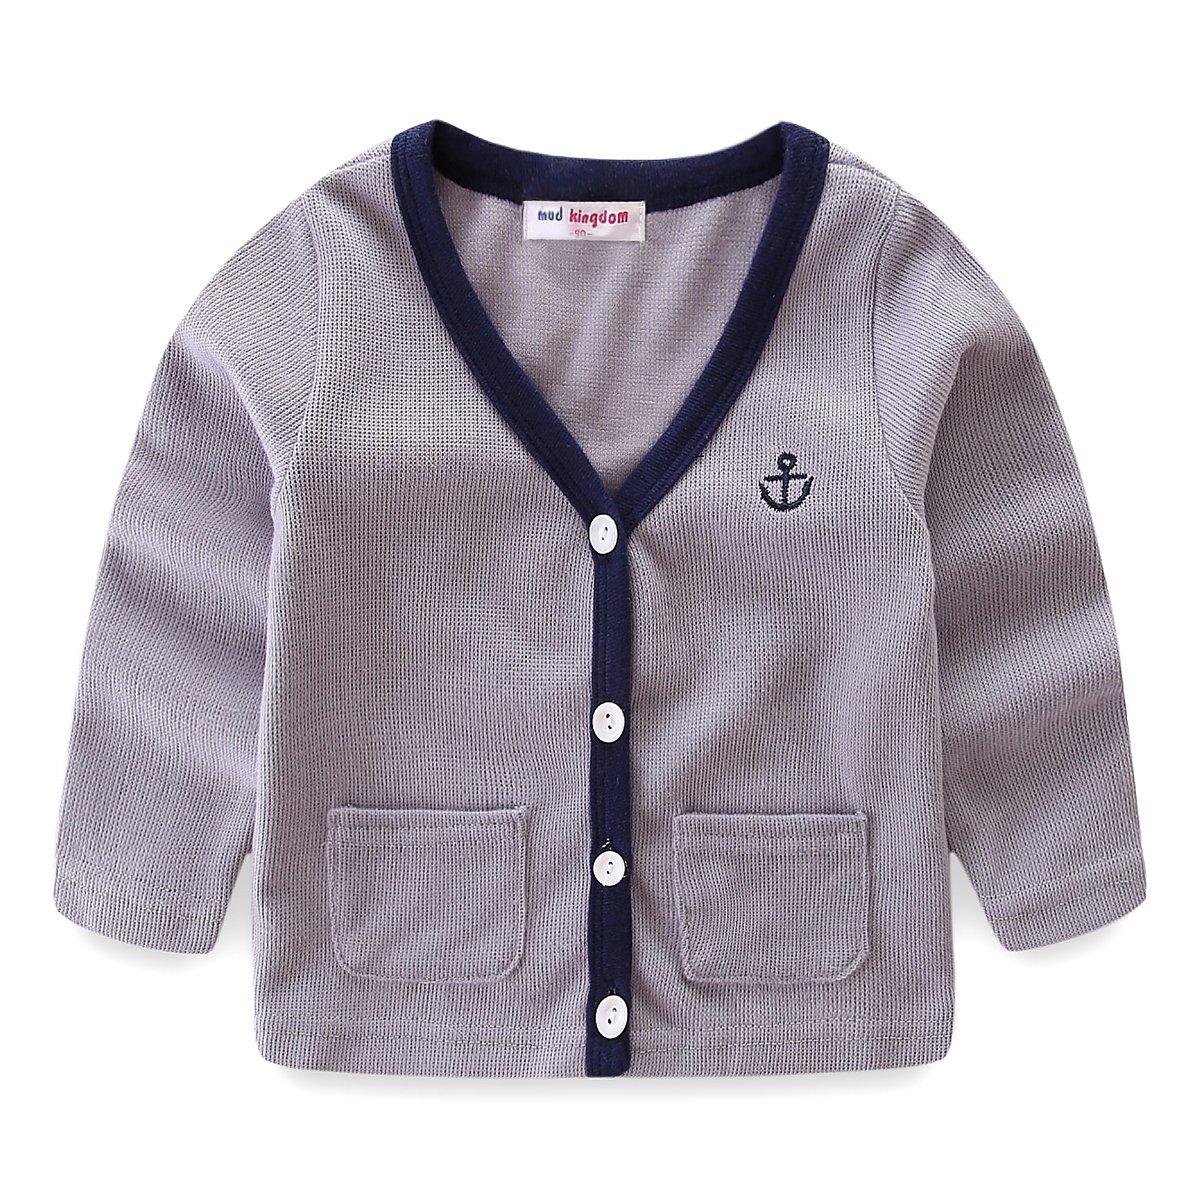 Mud Kingdom Cute Toddler Boy Fall Jacket 3T Plain Gray